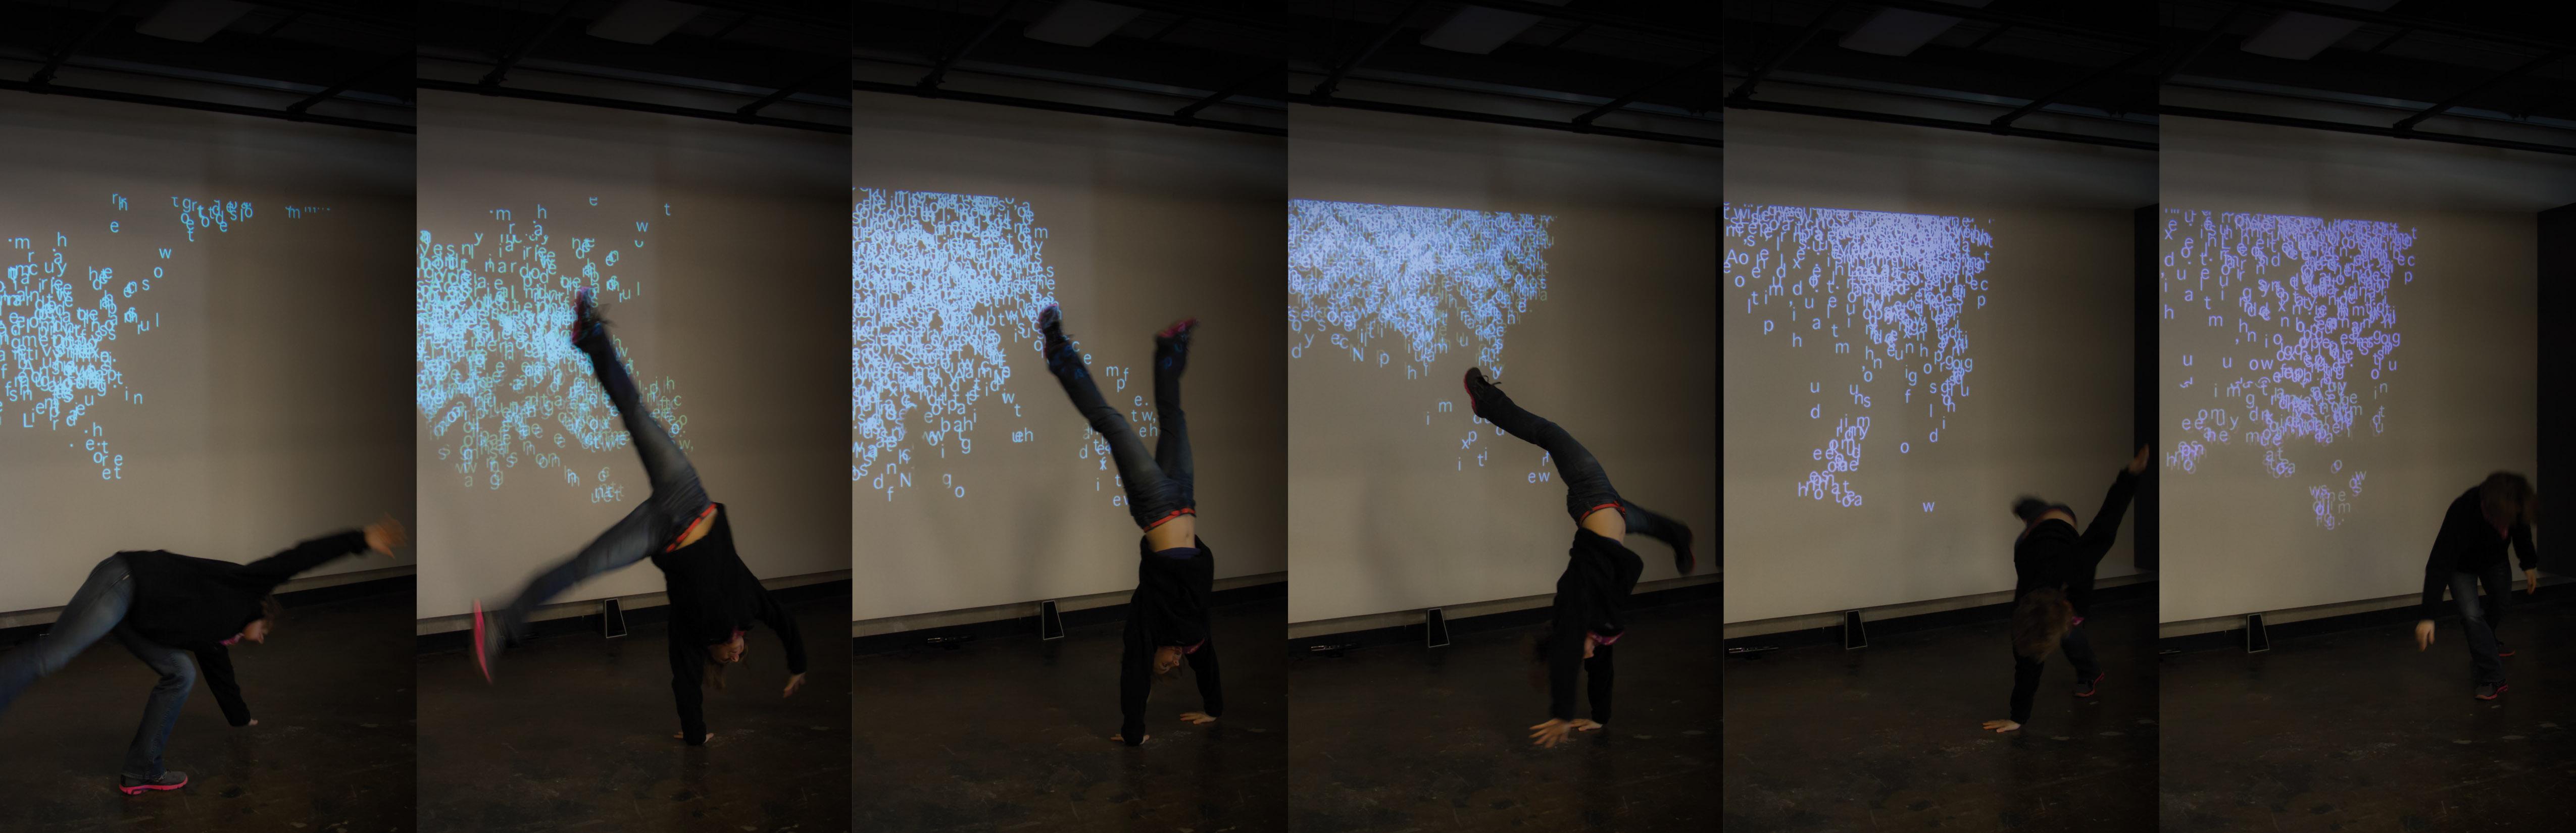 elicit (cartwheel)